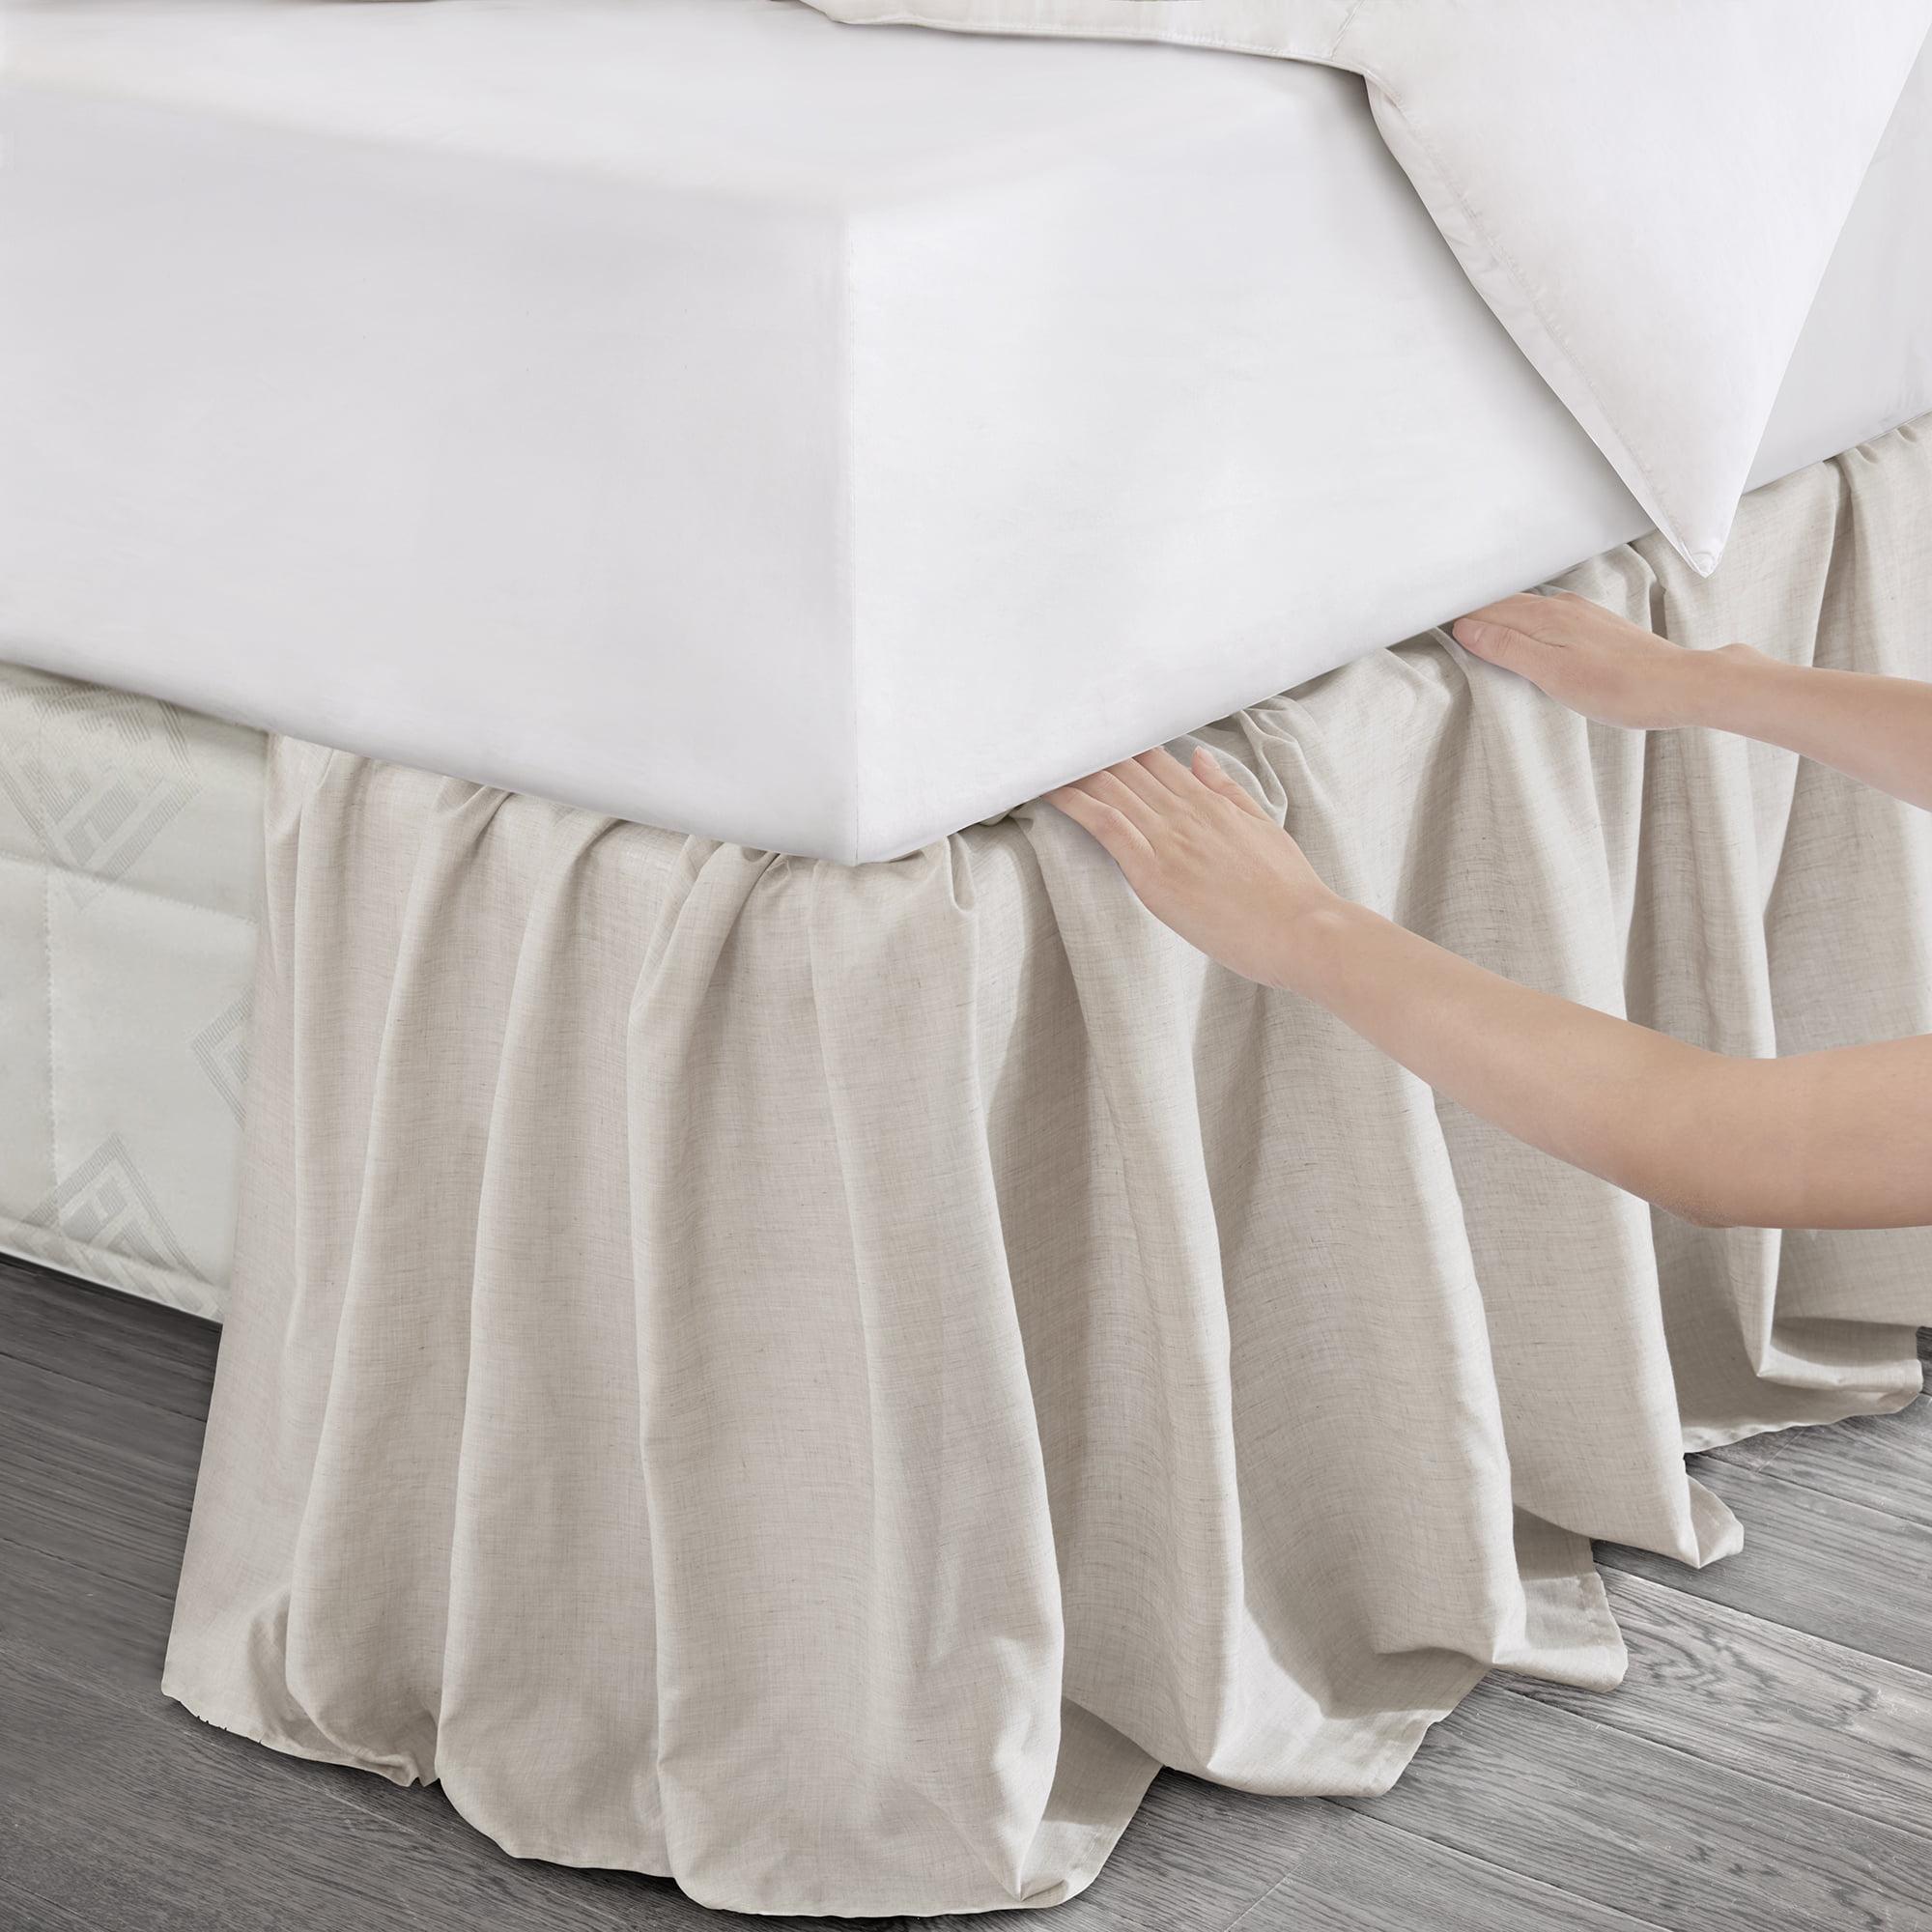 8f5f8d414 Extra Long Bed Skirt Walmart | Huston Fislar Photography